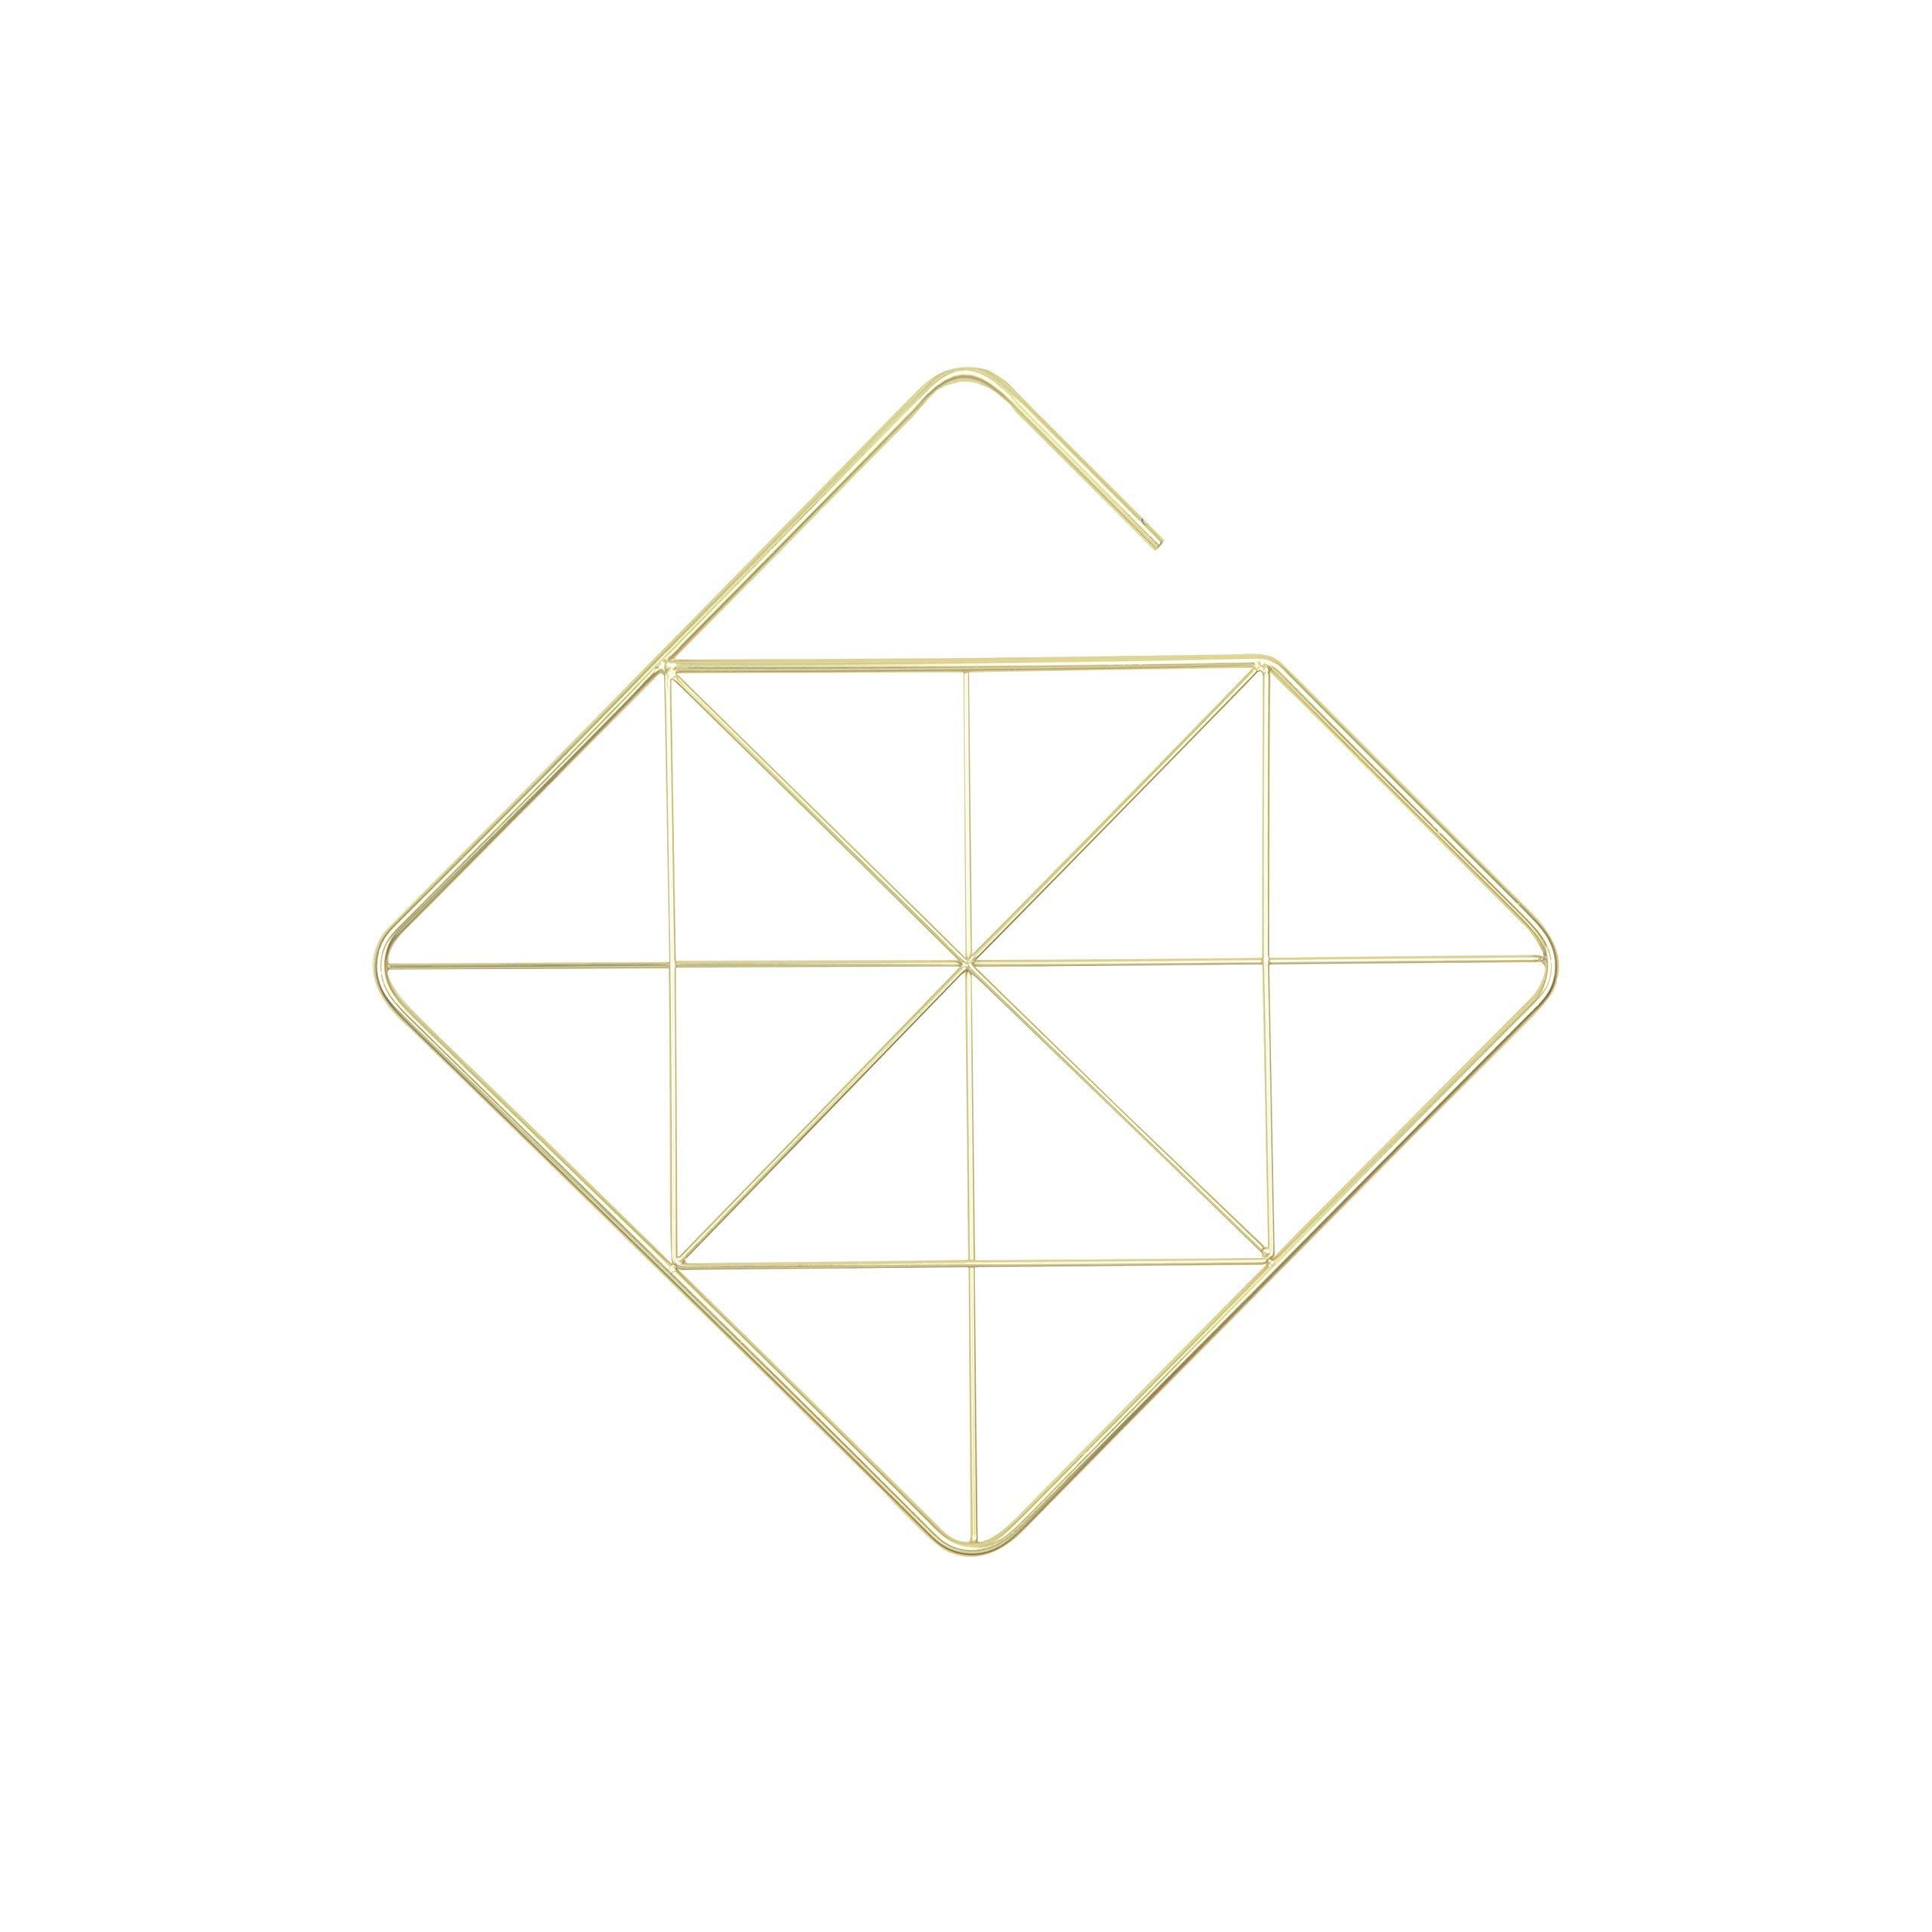 Umbra Pendant Diamond Geometric Copper Scarf Hanger/Accessory Hanger, Brass by Umbra